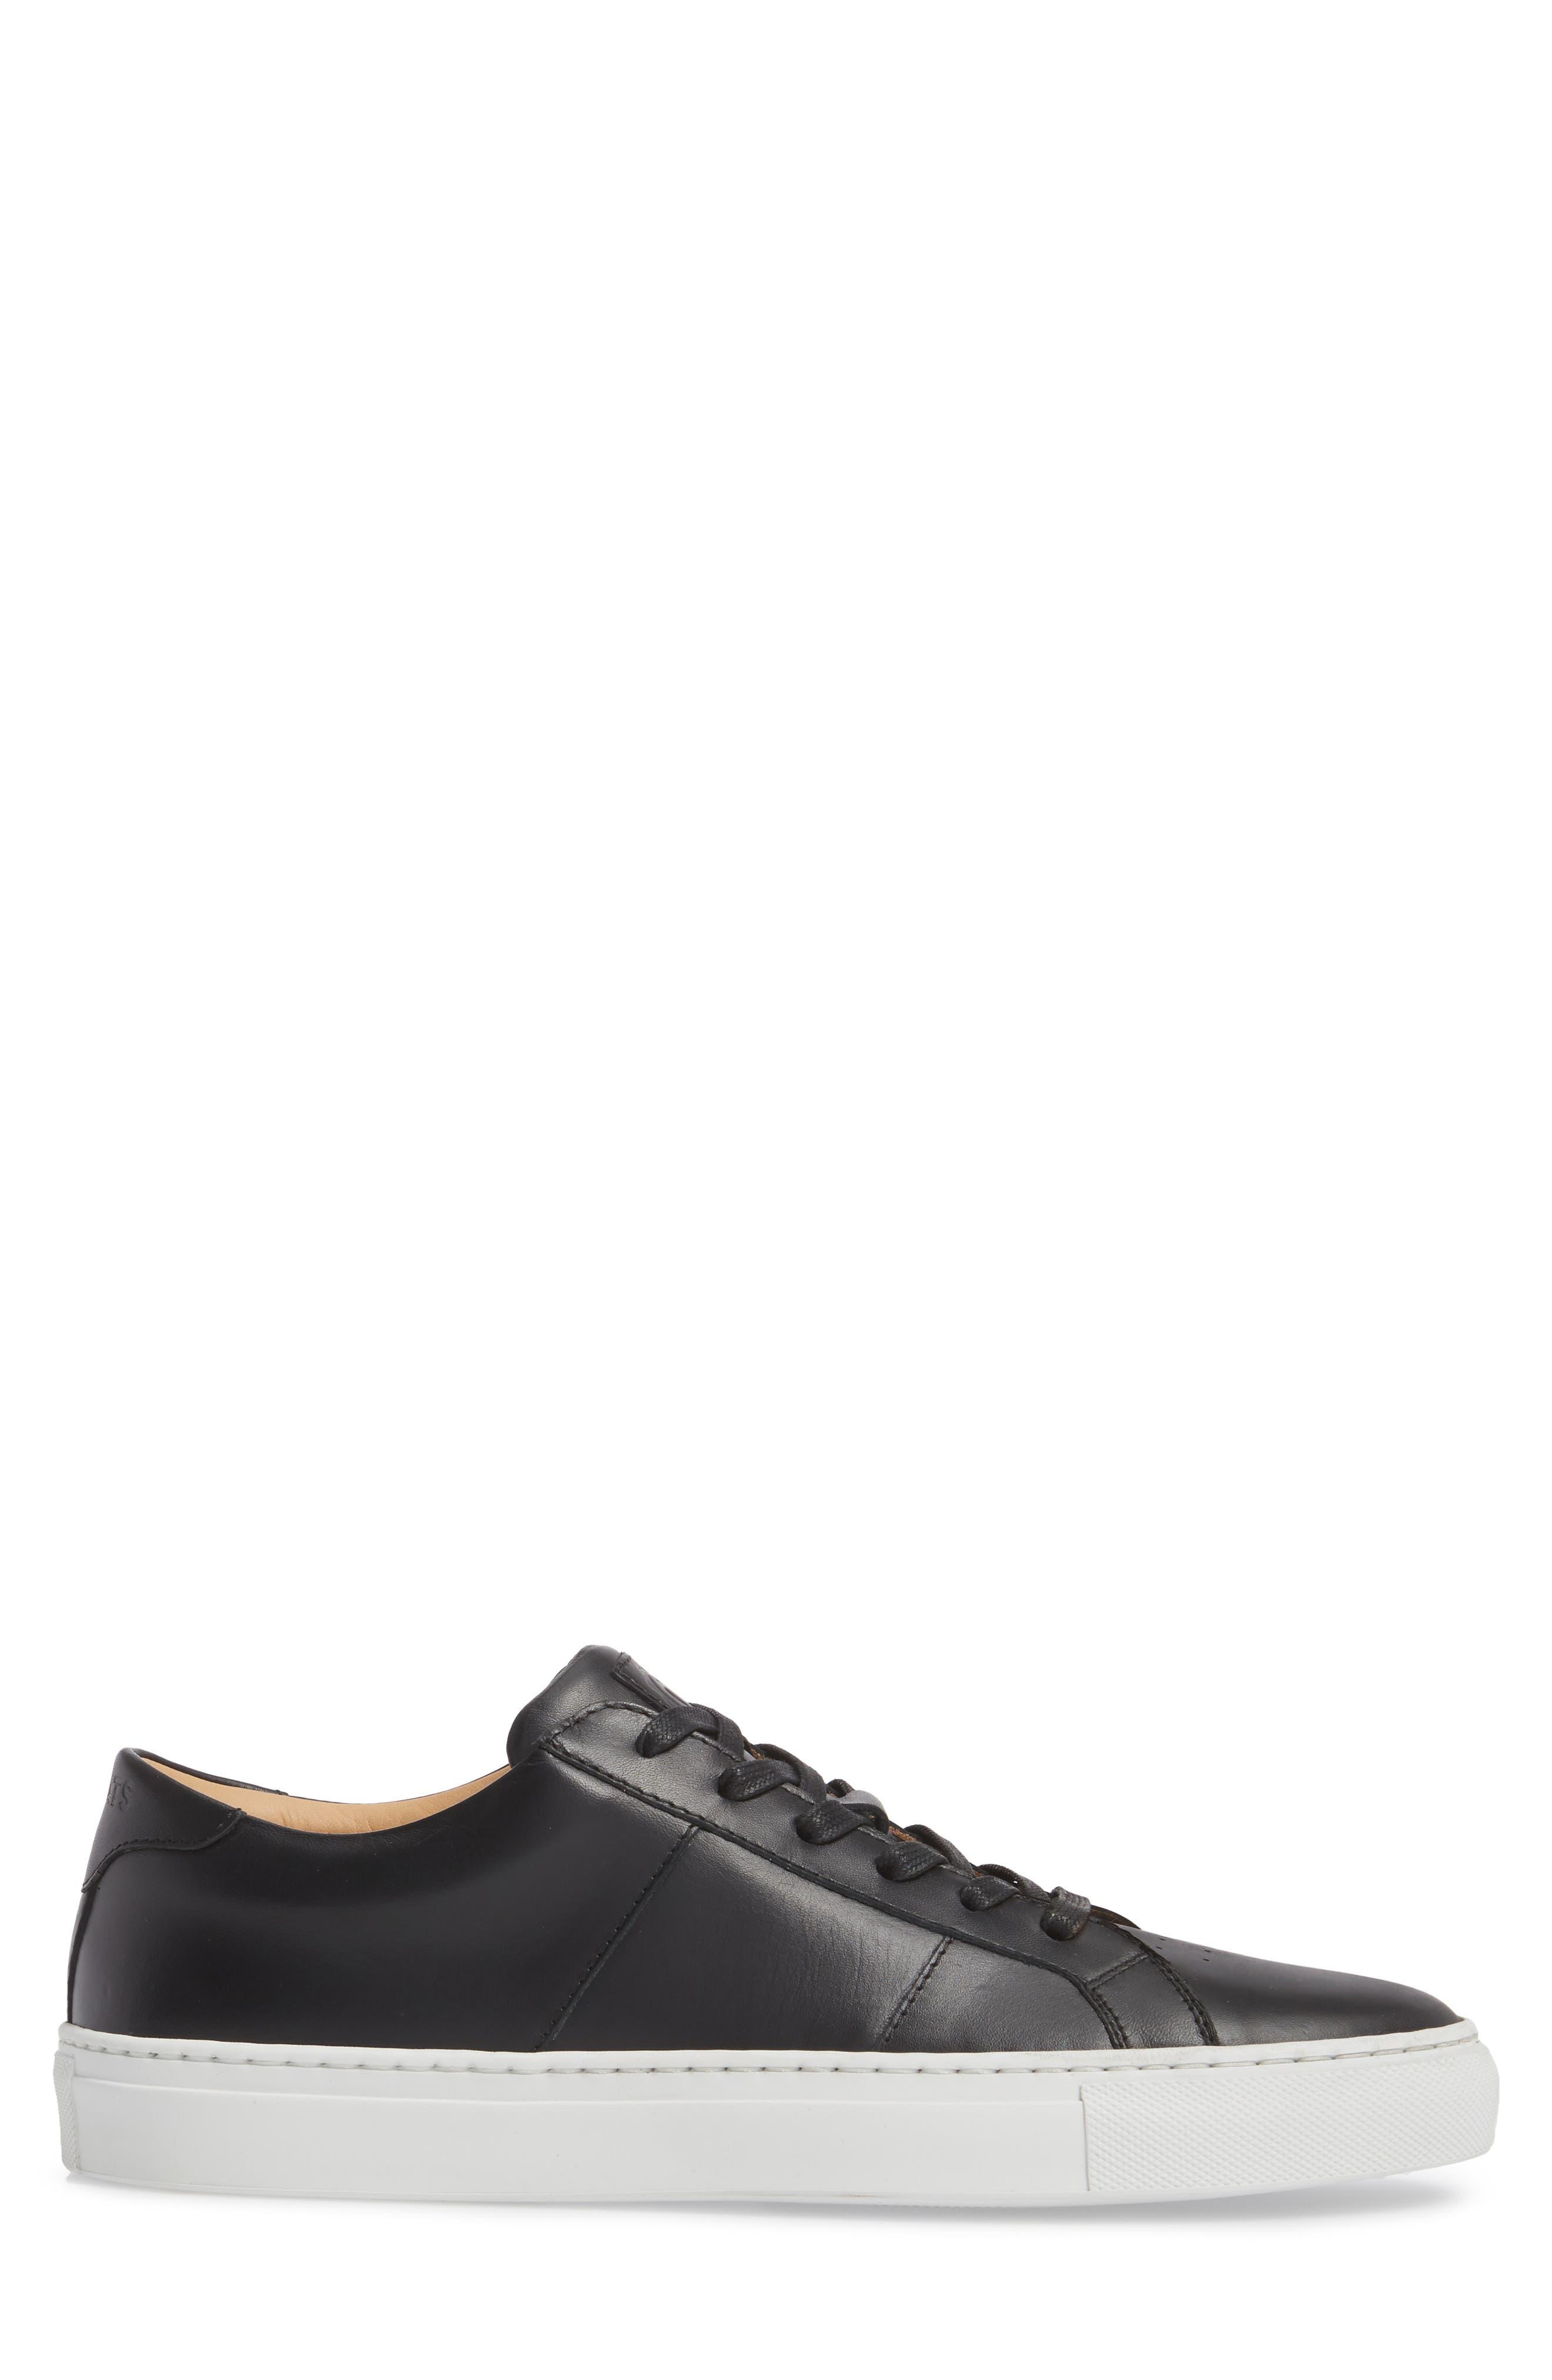 Royale Sneaker,                             Alternate thumbnail 3, color,                             BLACK LEATHER